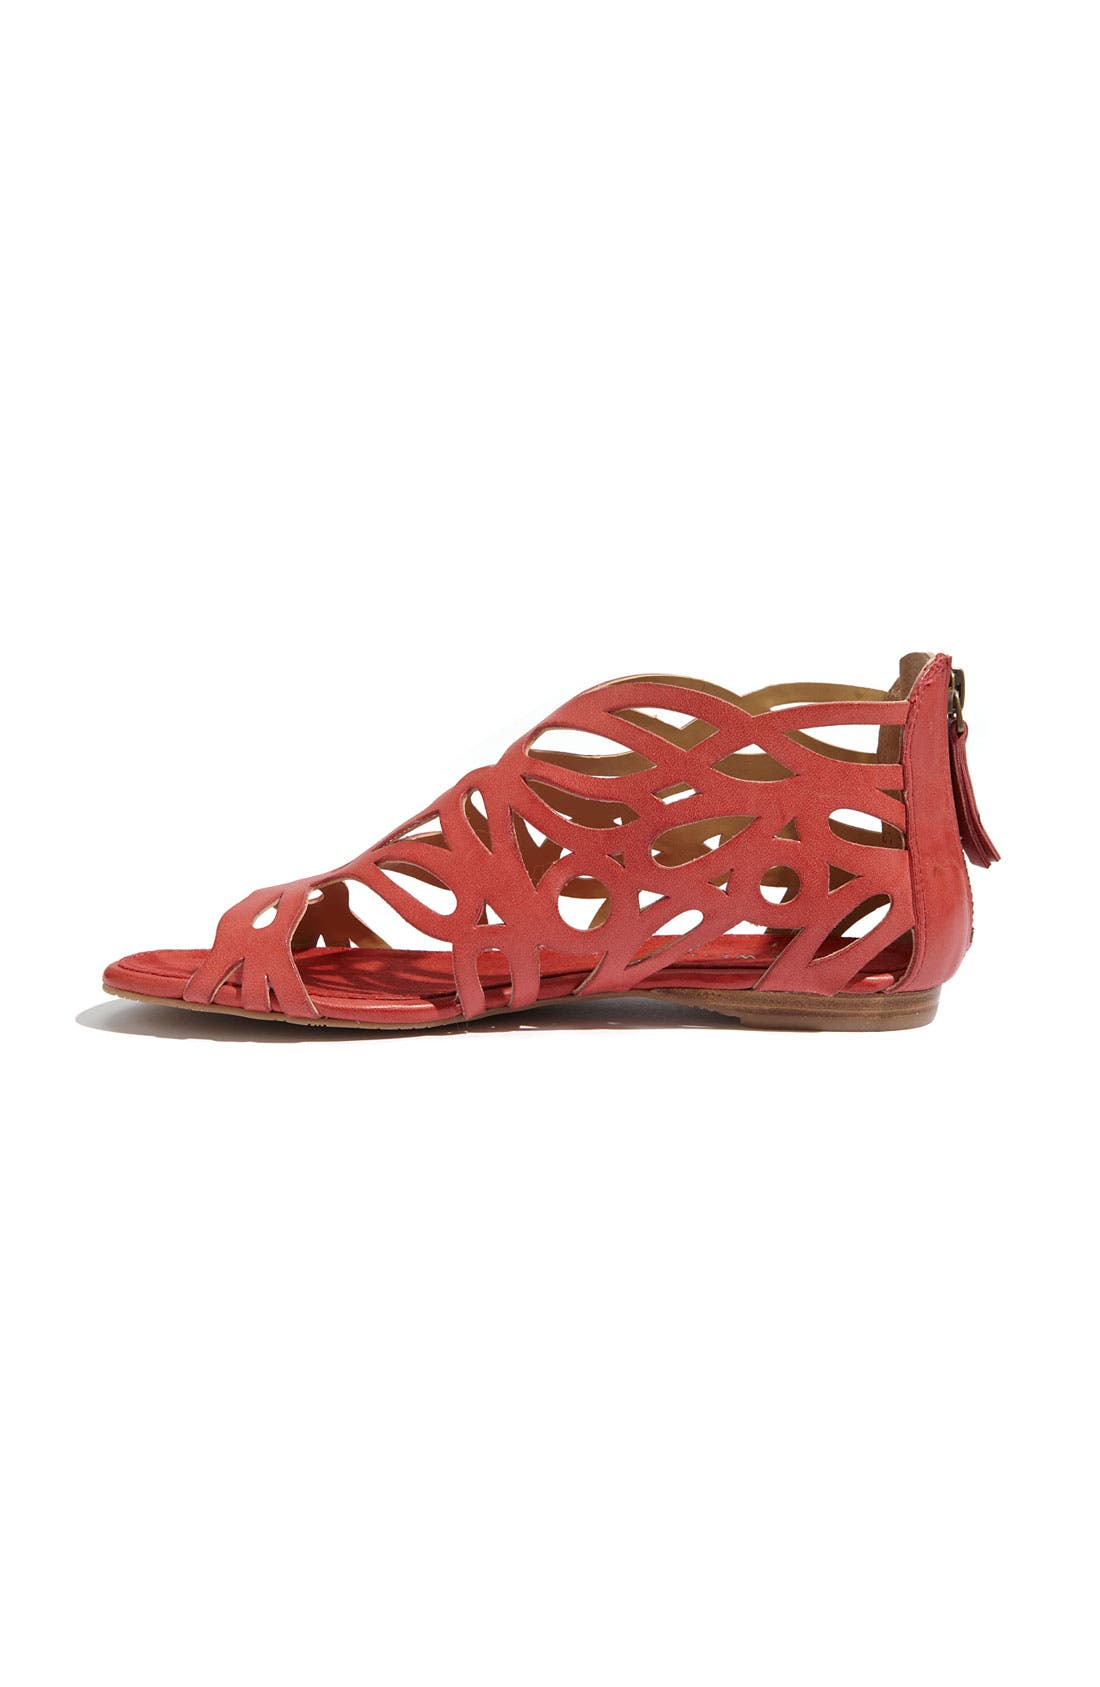 'Tali' Sandal,                             Alternate thumbnail 2, color,                             Red Leather